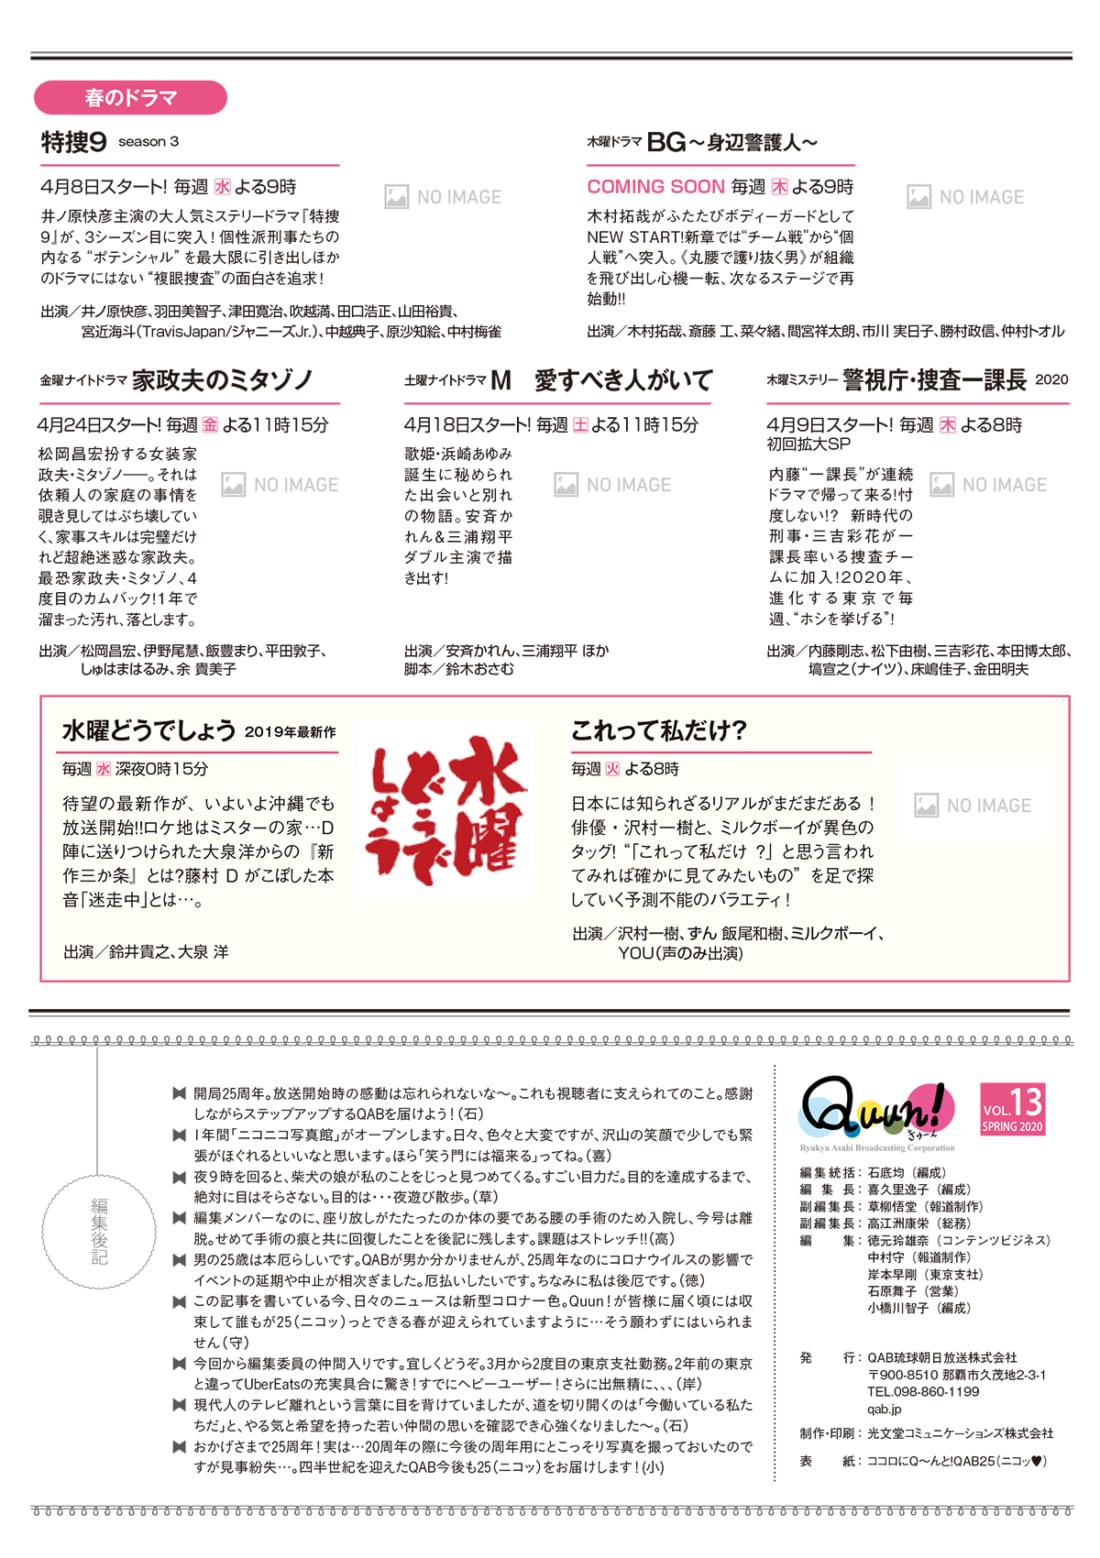 https://www.qab.co.jp/qgoro/wp-content/uploads/quun_1313-1100x1558.jpg